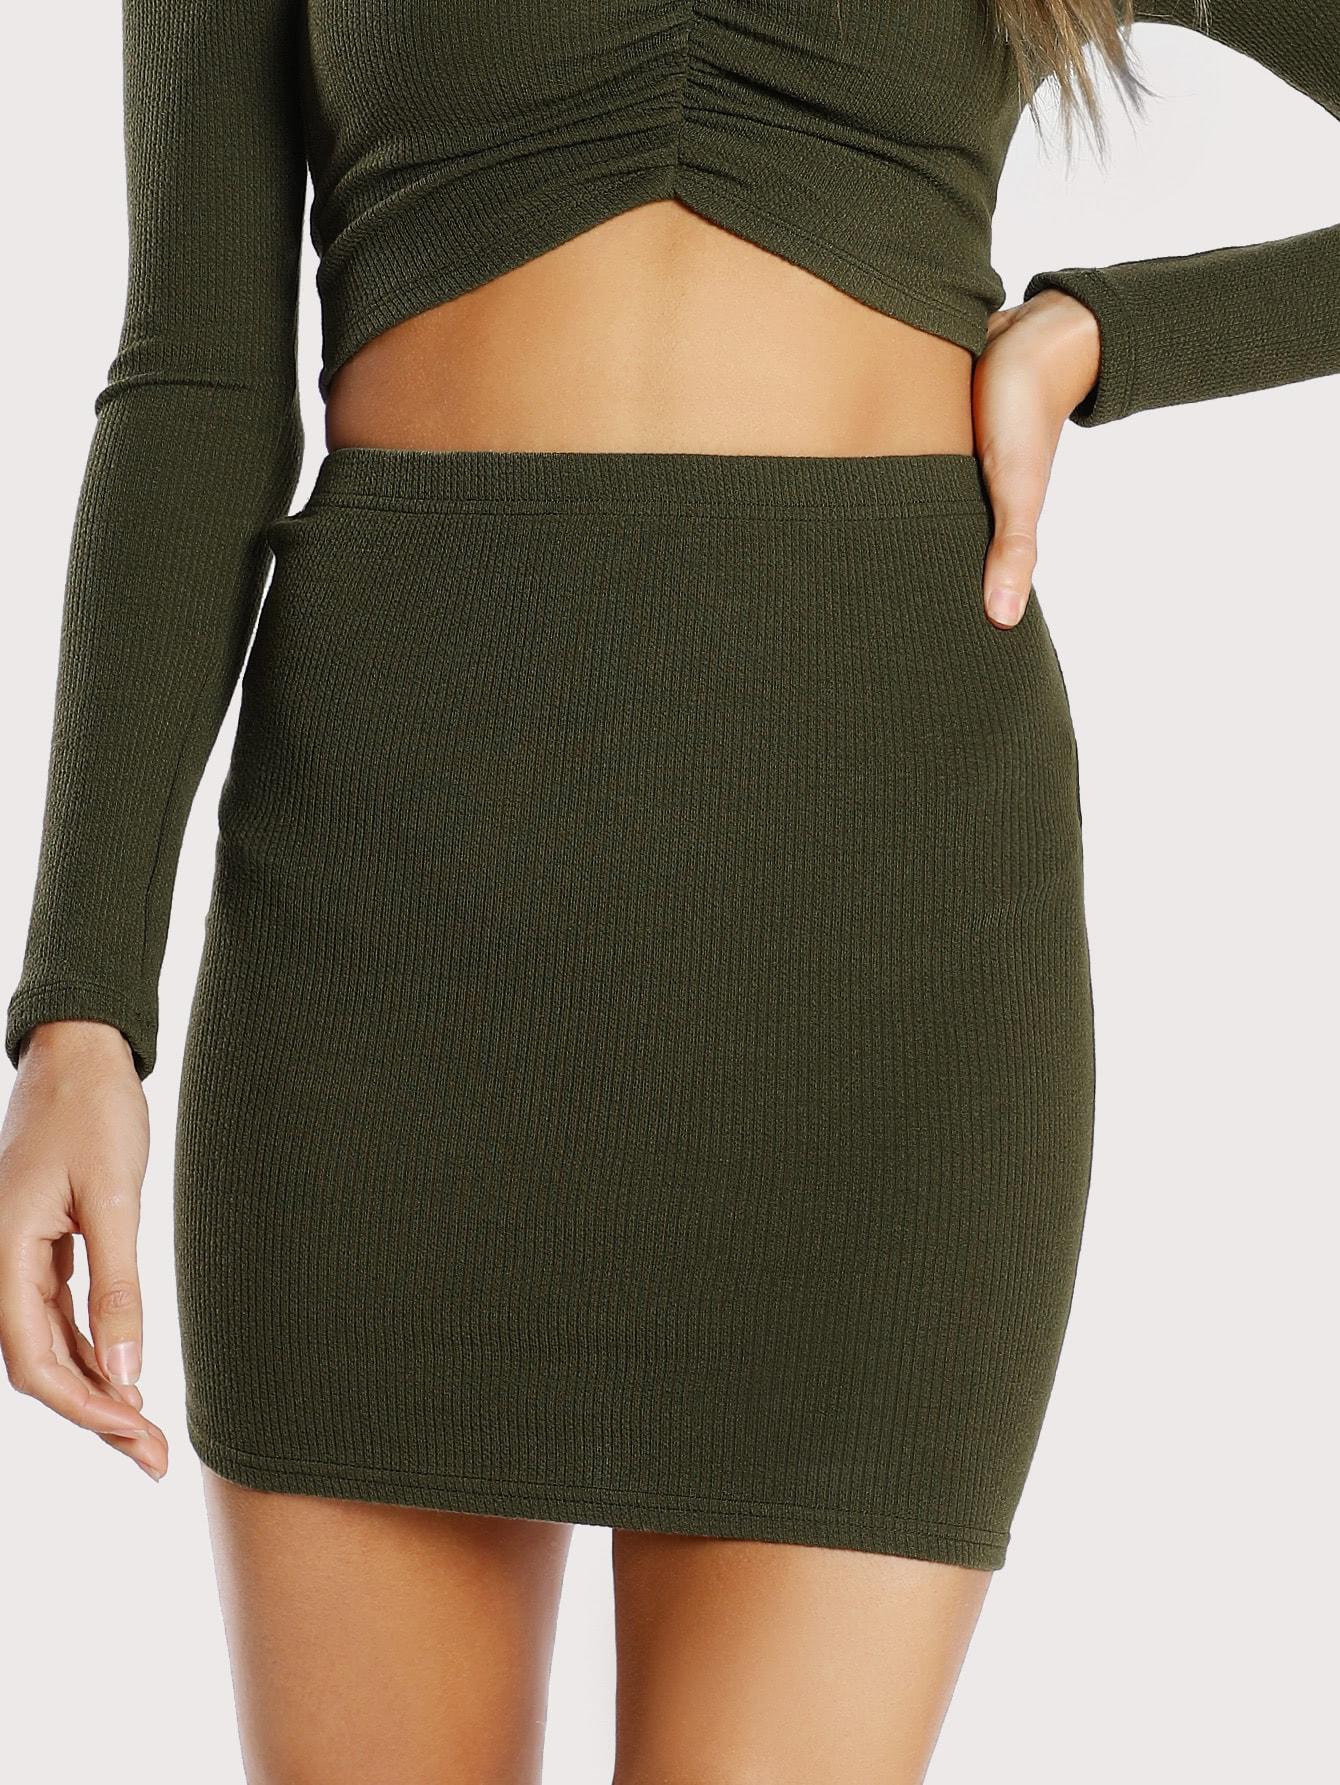 Ribbed Knit Bodycon Skirt skirtmmc171018701